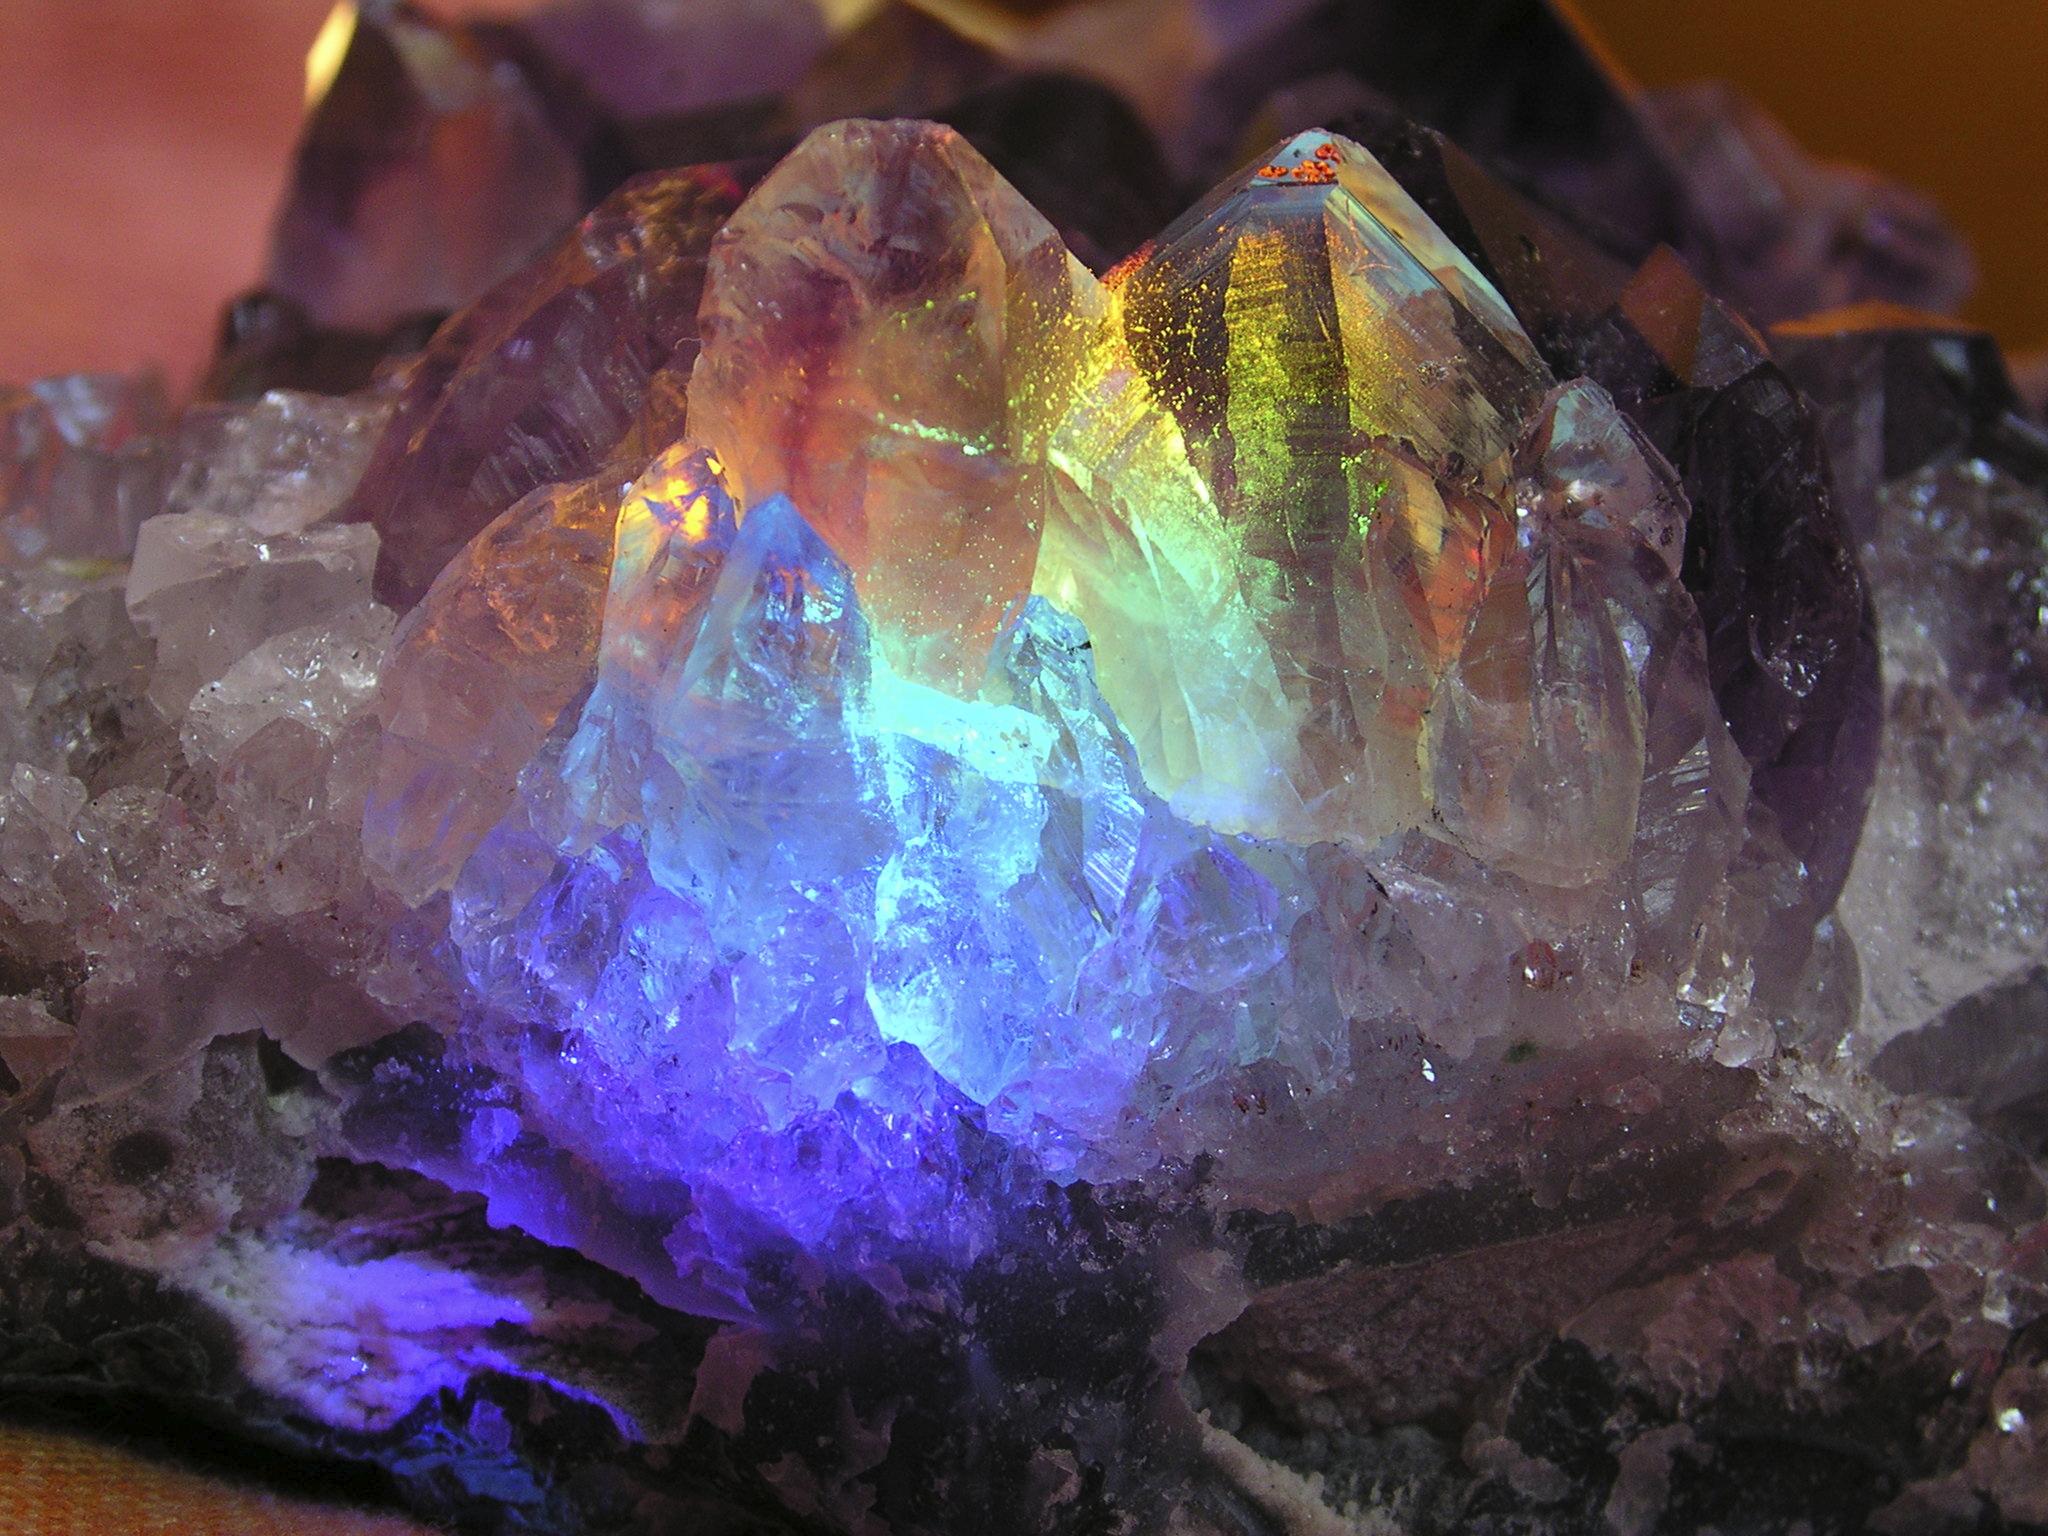 Crystal-mineral-gem-geology-nature-wallpaper-wp4004145